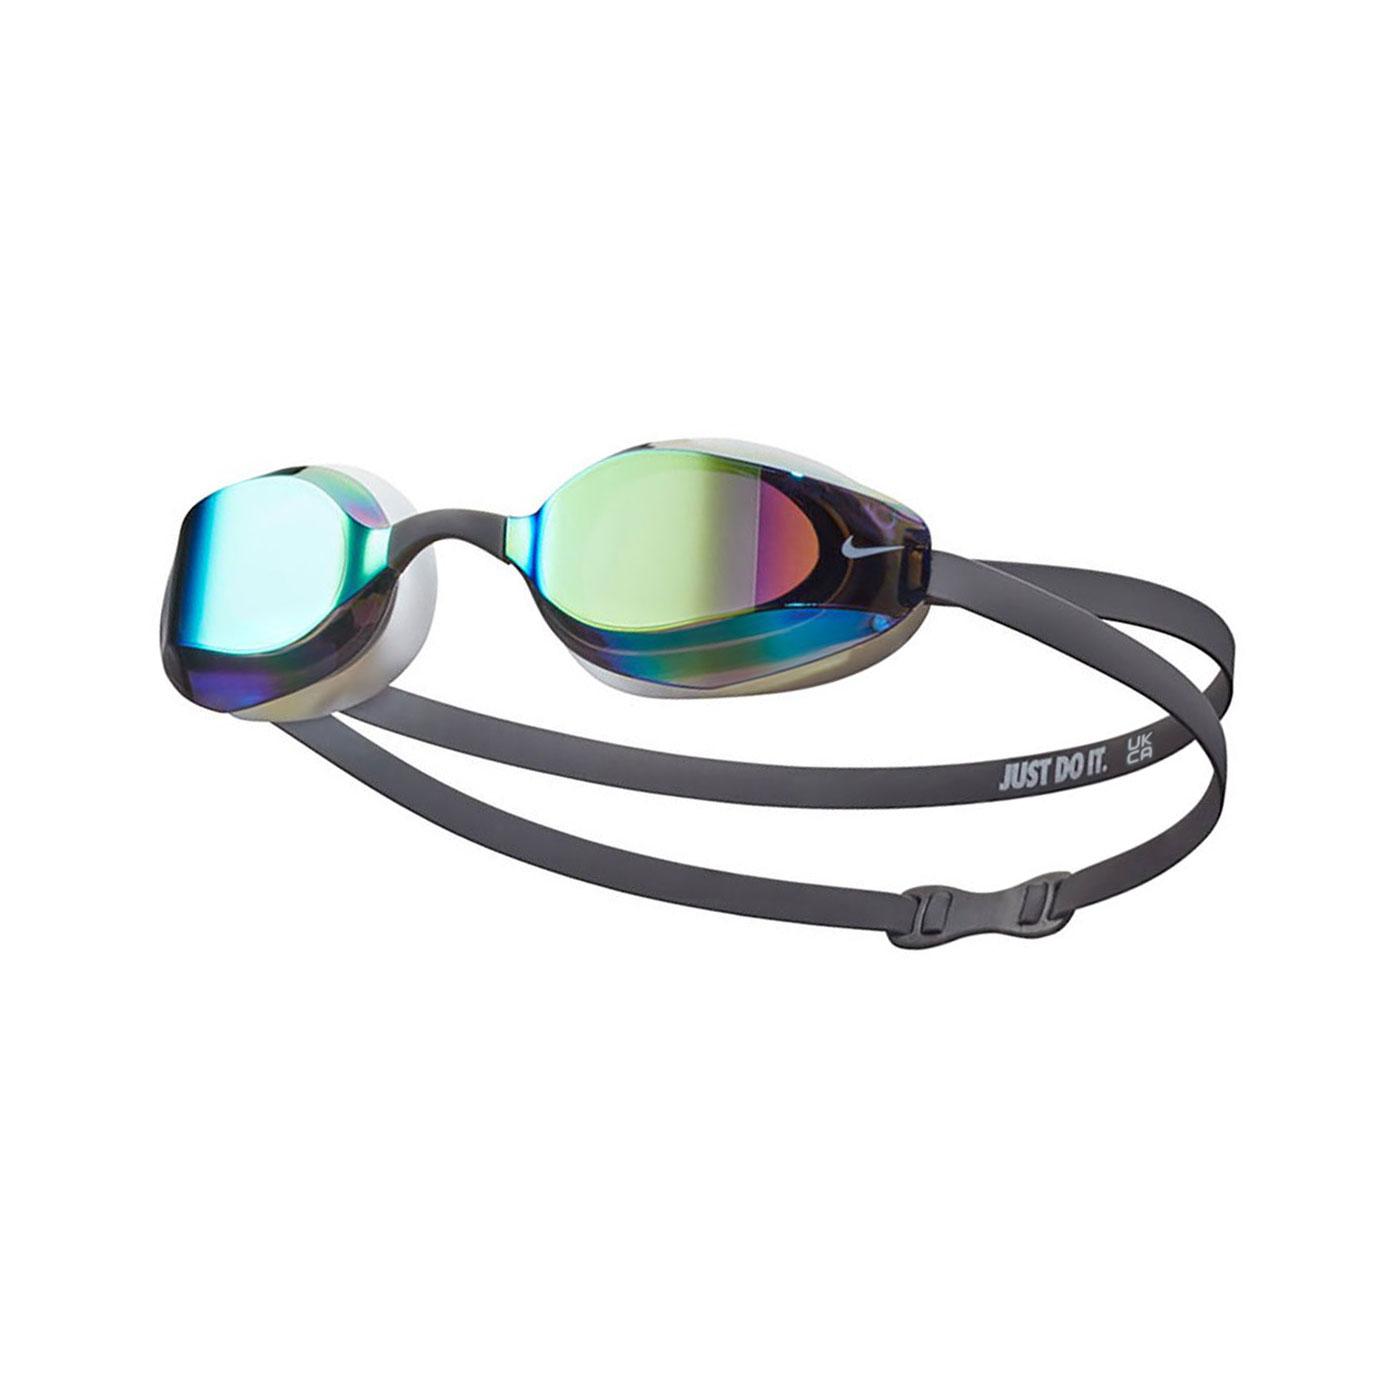 NIKE 成人專業型鏡面泳鏡 NESSA176-018 - 深灰白